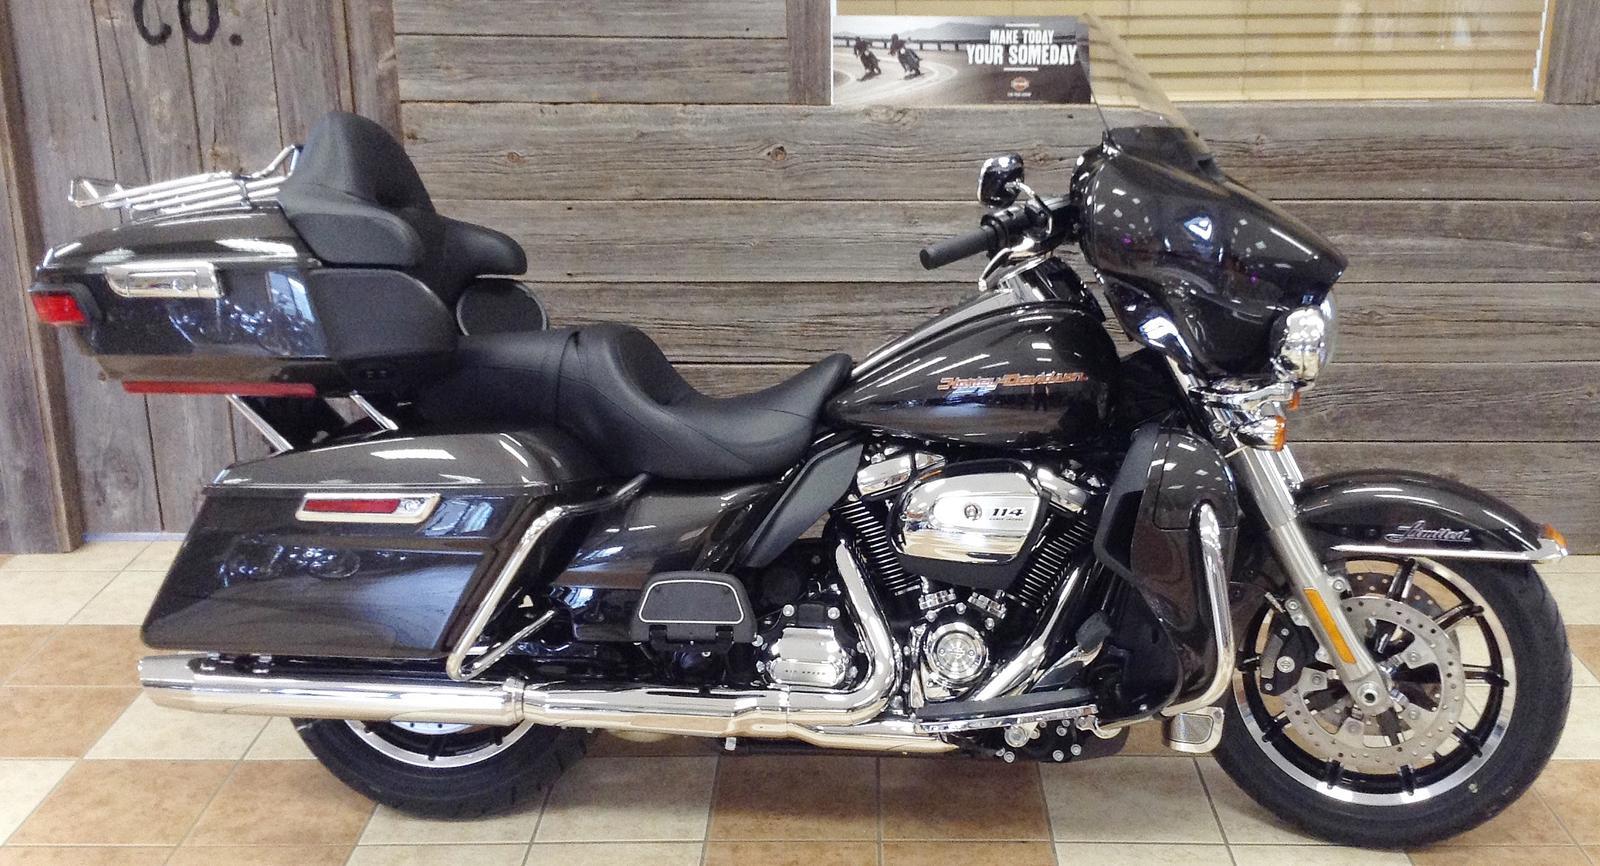 2019 Harley-Davidson® FLHTK Electra Glide® Ultra Limited - Two-Tone on mercedes benz fuses, victory motorcycle fuses, lexus fuses, ford fuses, bmw fuses, harley sportster fuses, john deere fuses,